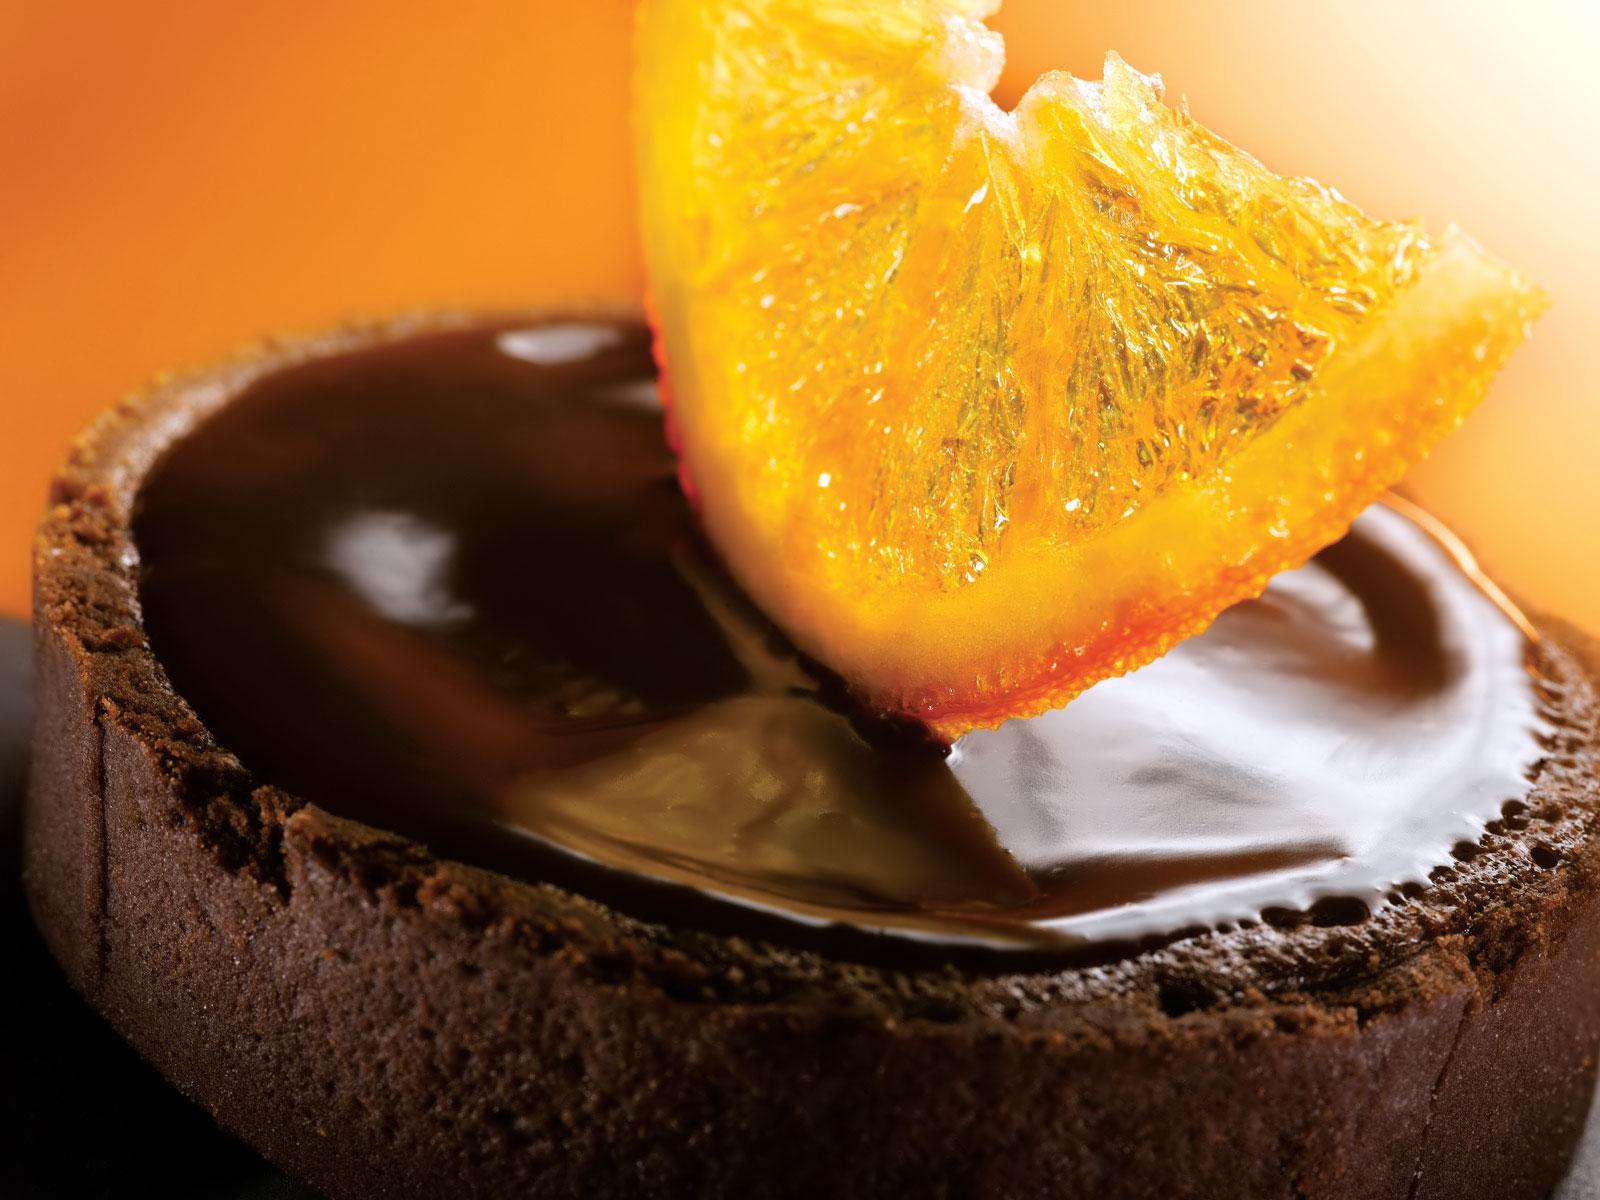 Orange and Chocolate (Renee Espriu) – Gabe Feathers McGee